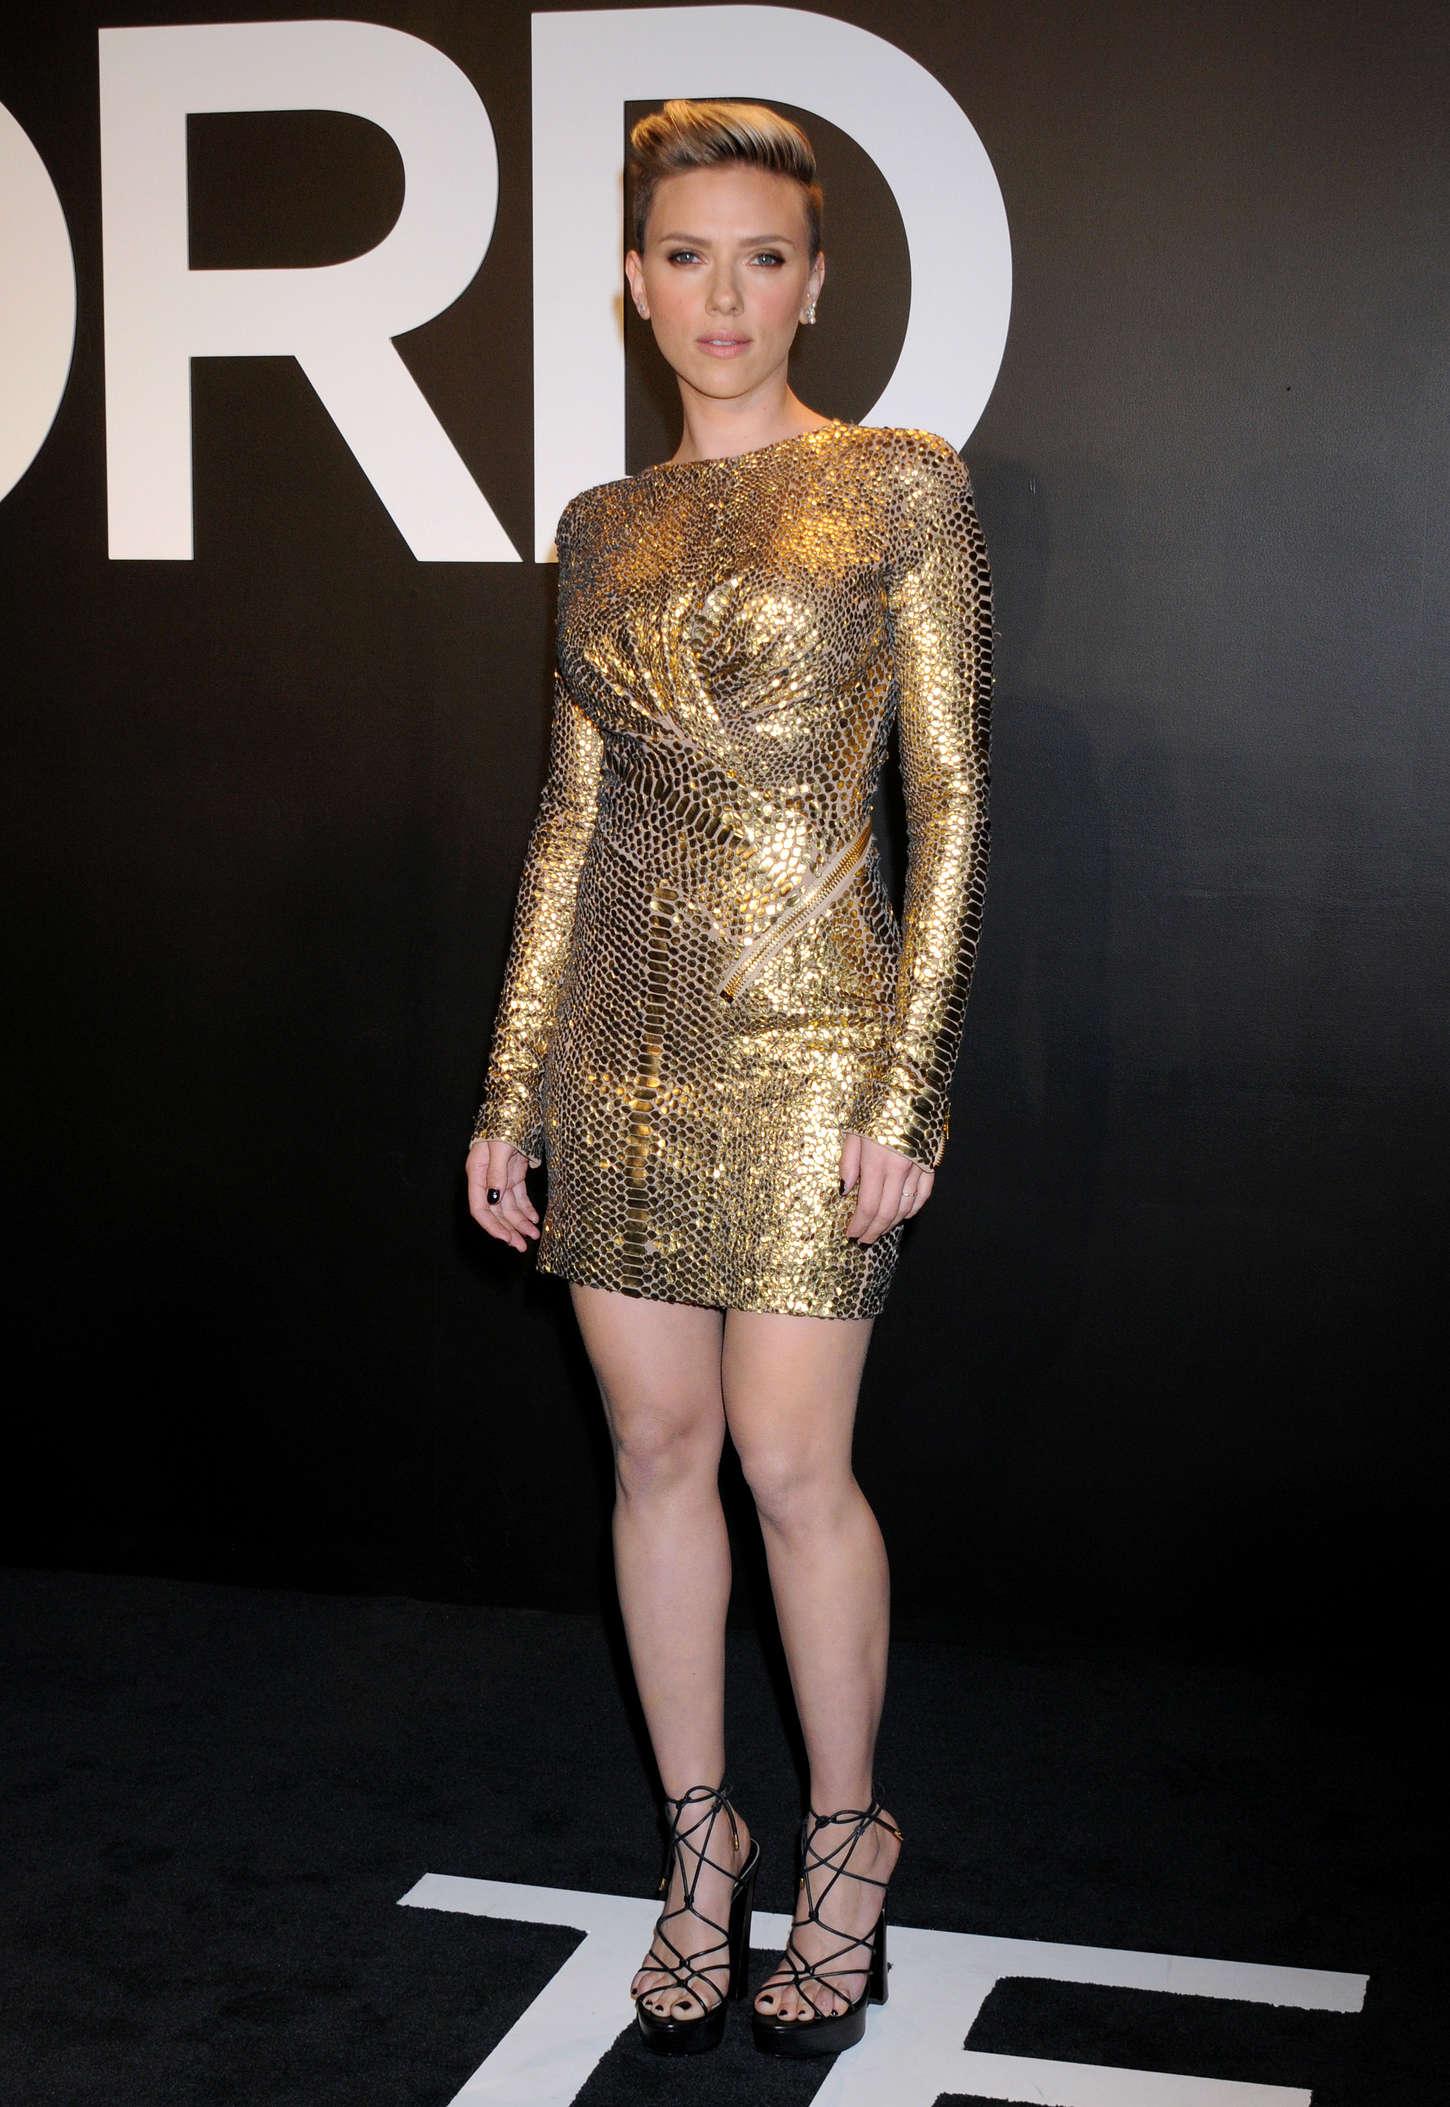 Amy Adams Hd Wallpapers Scarlett Johansson Tom Ford 2015 Womenswear Collection